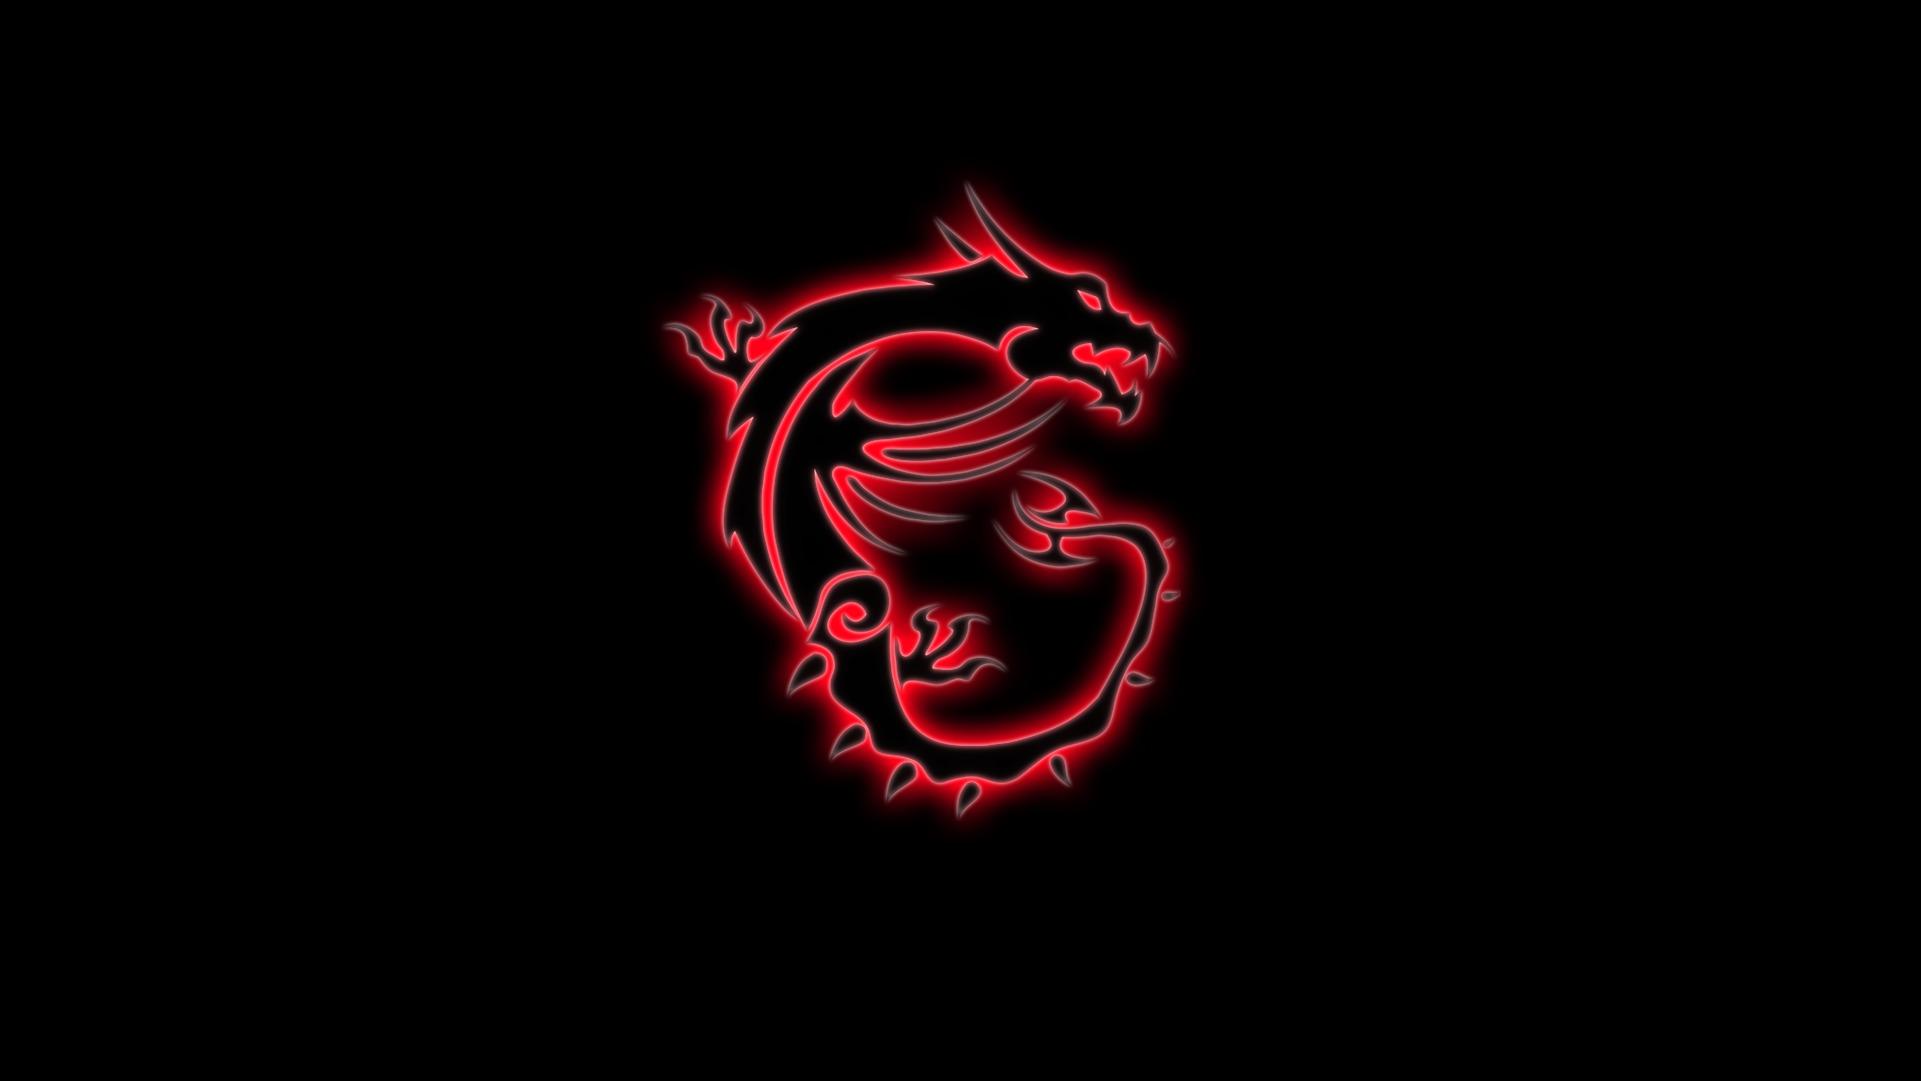 Msi micro star international gaming dragon red game red dragon 1921x1081